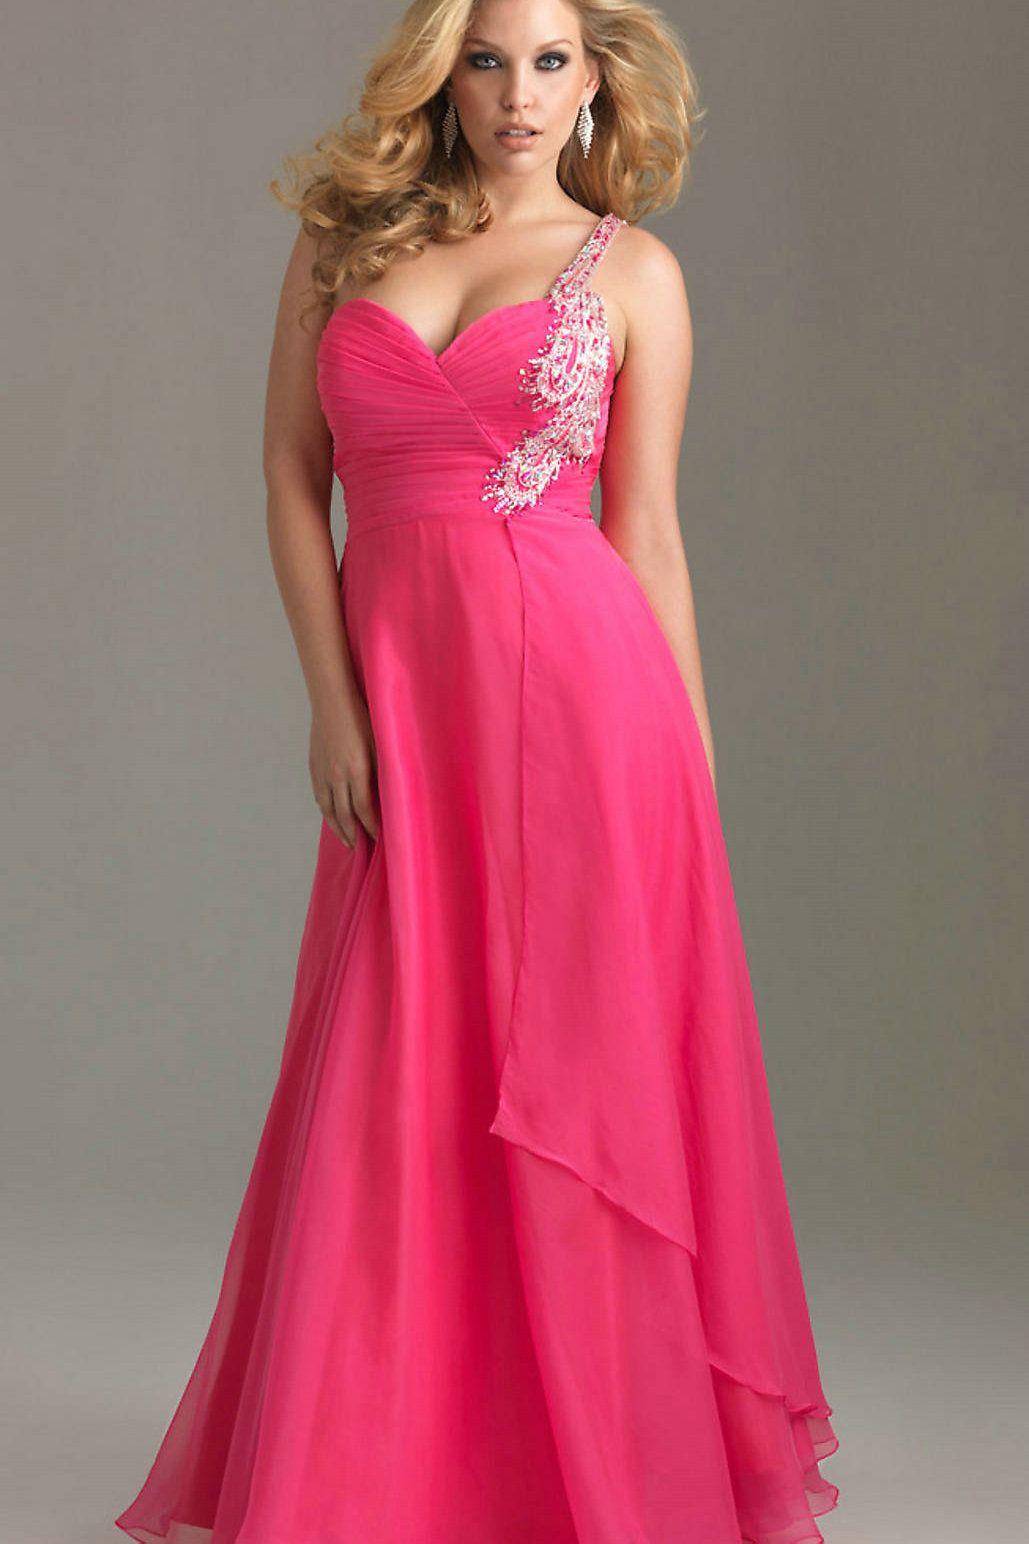 Fashionable Plus Size Evening Wear | Pinterest | Hot pink, Bodice ...